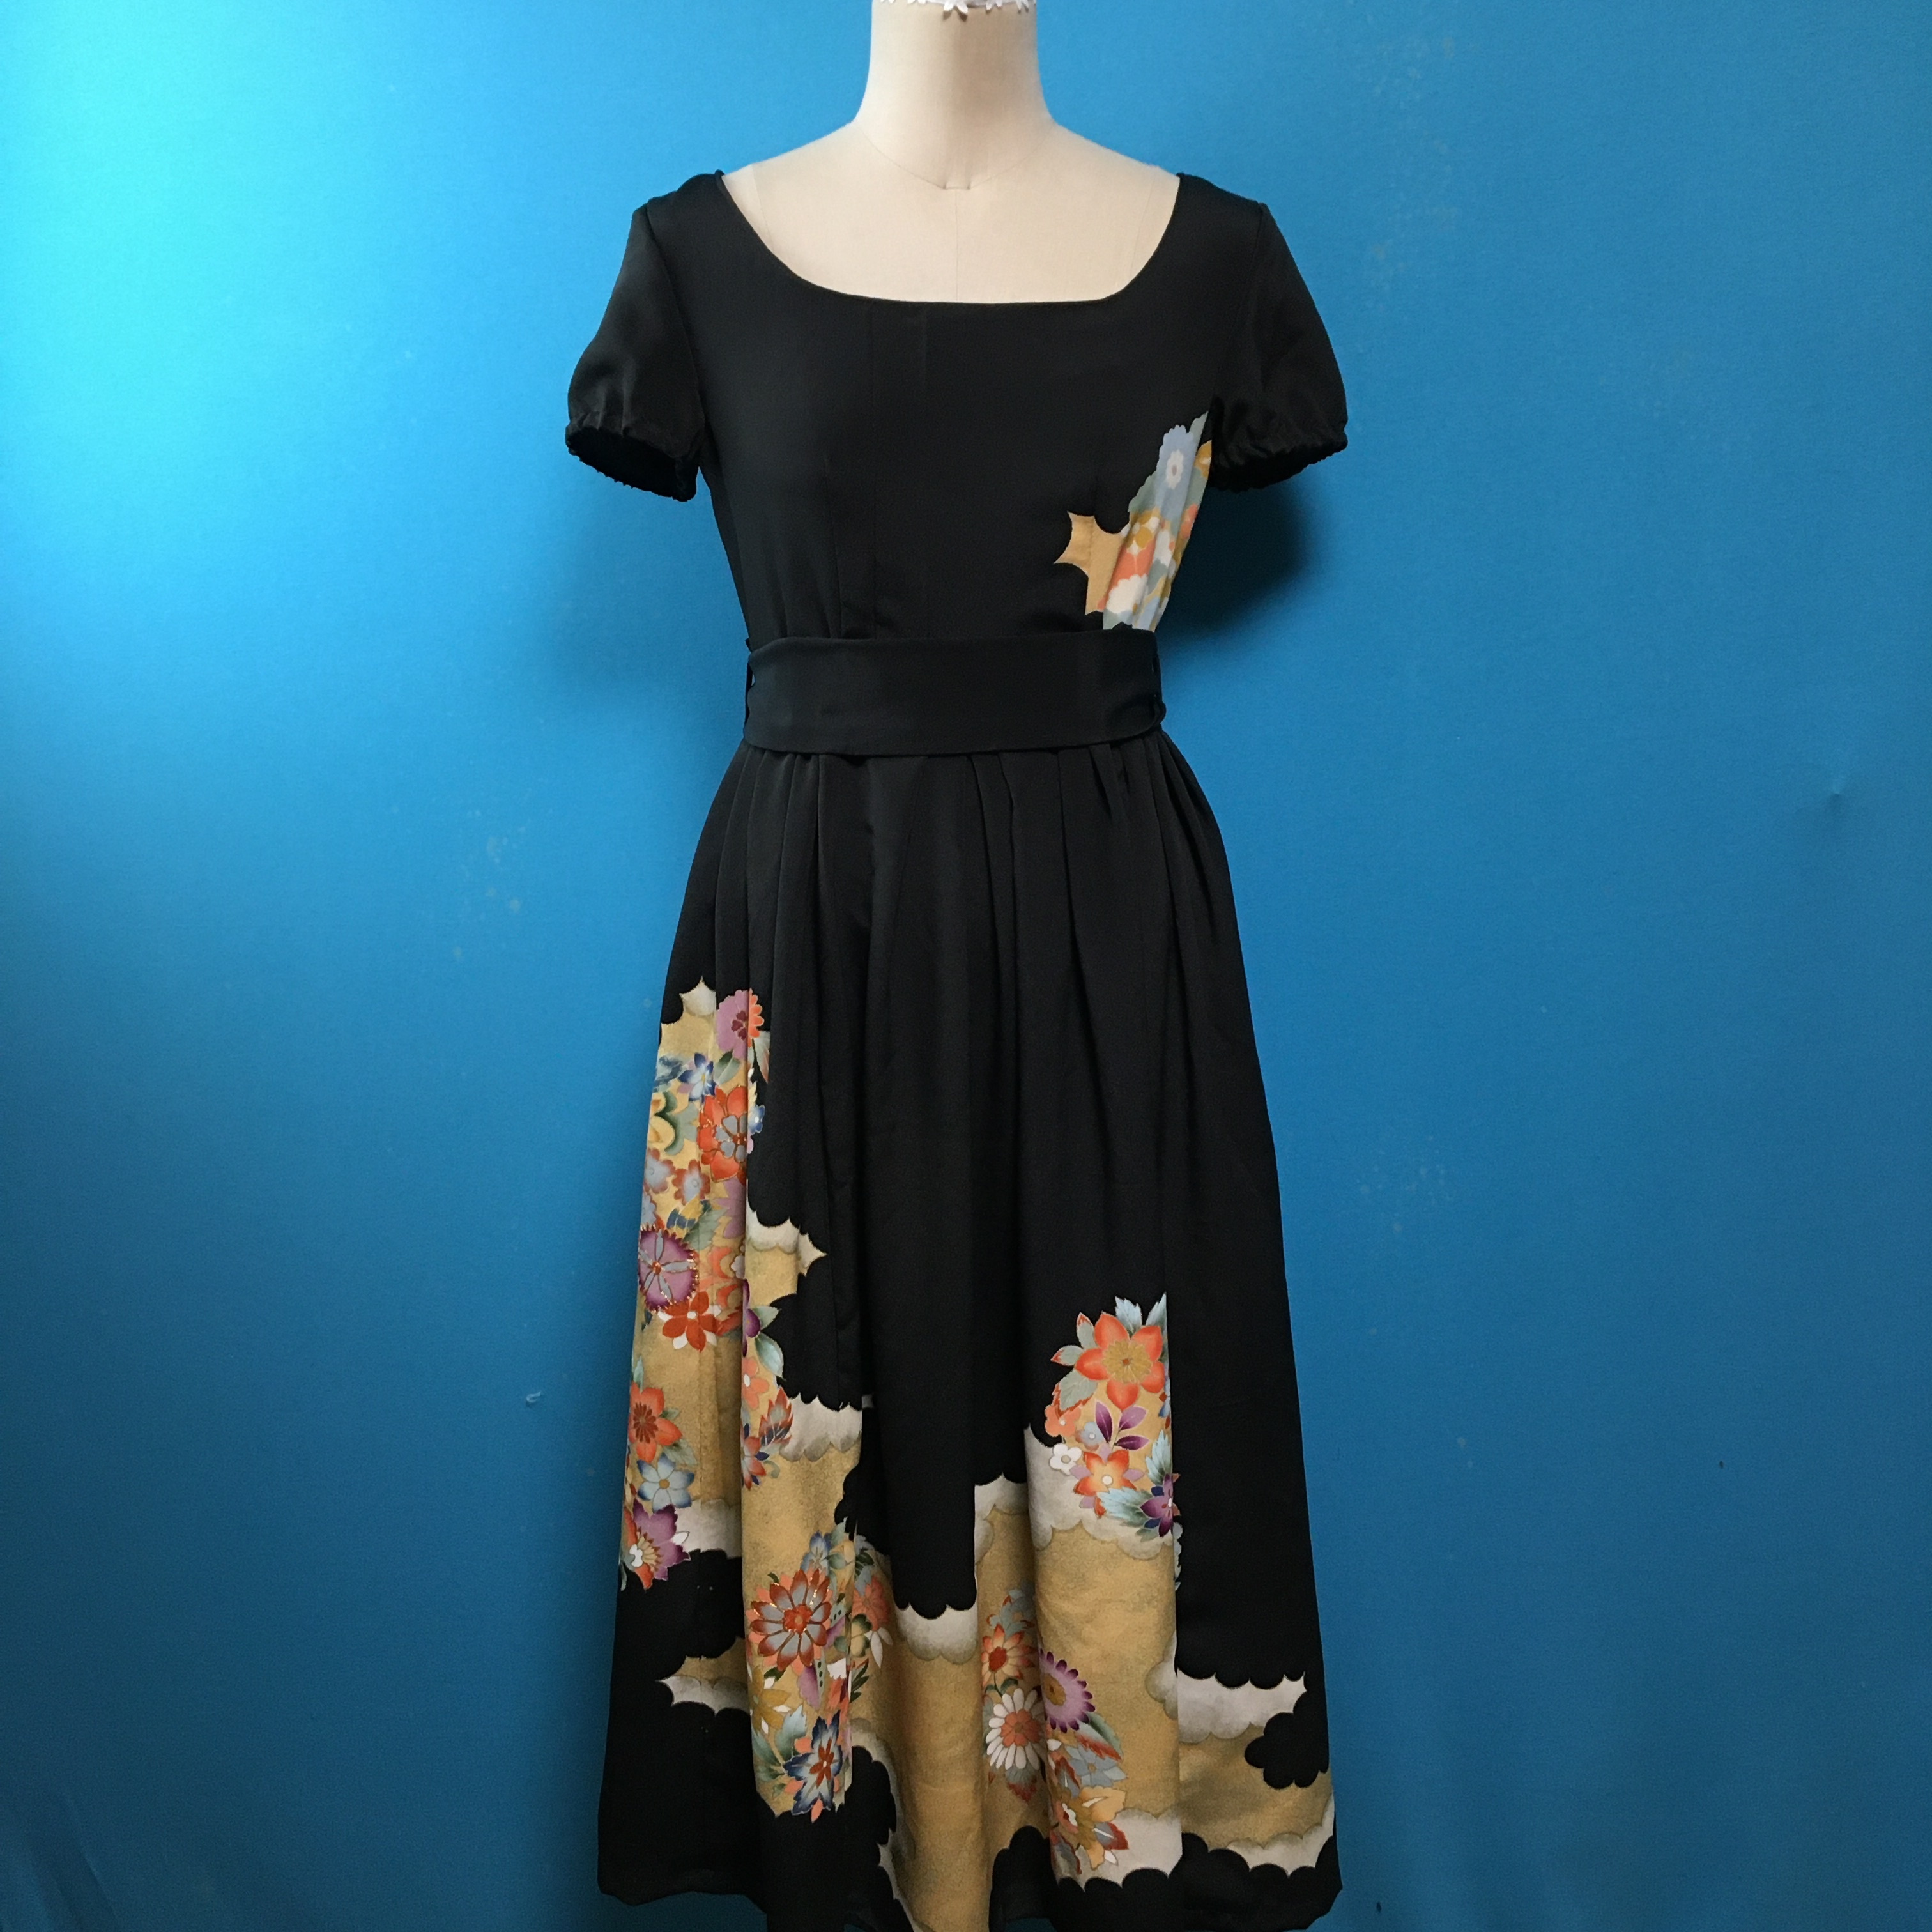 Vintage 留袖 作家落款入りレトロワンピース